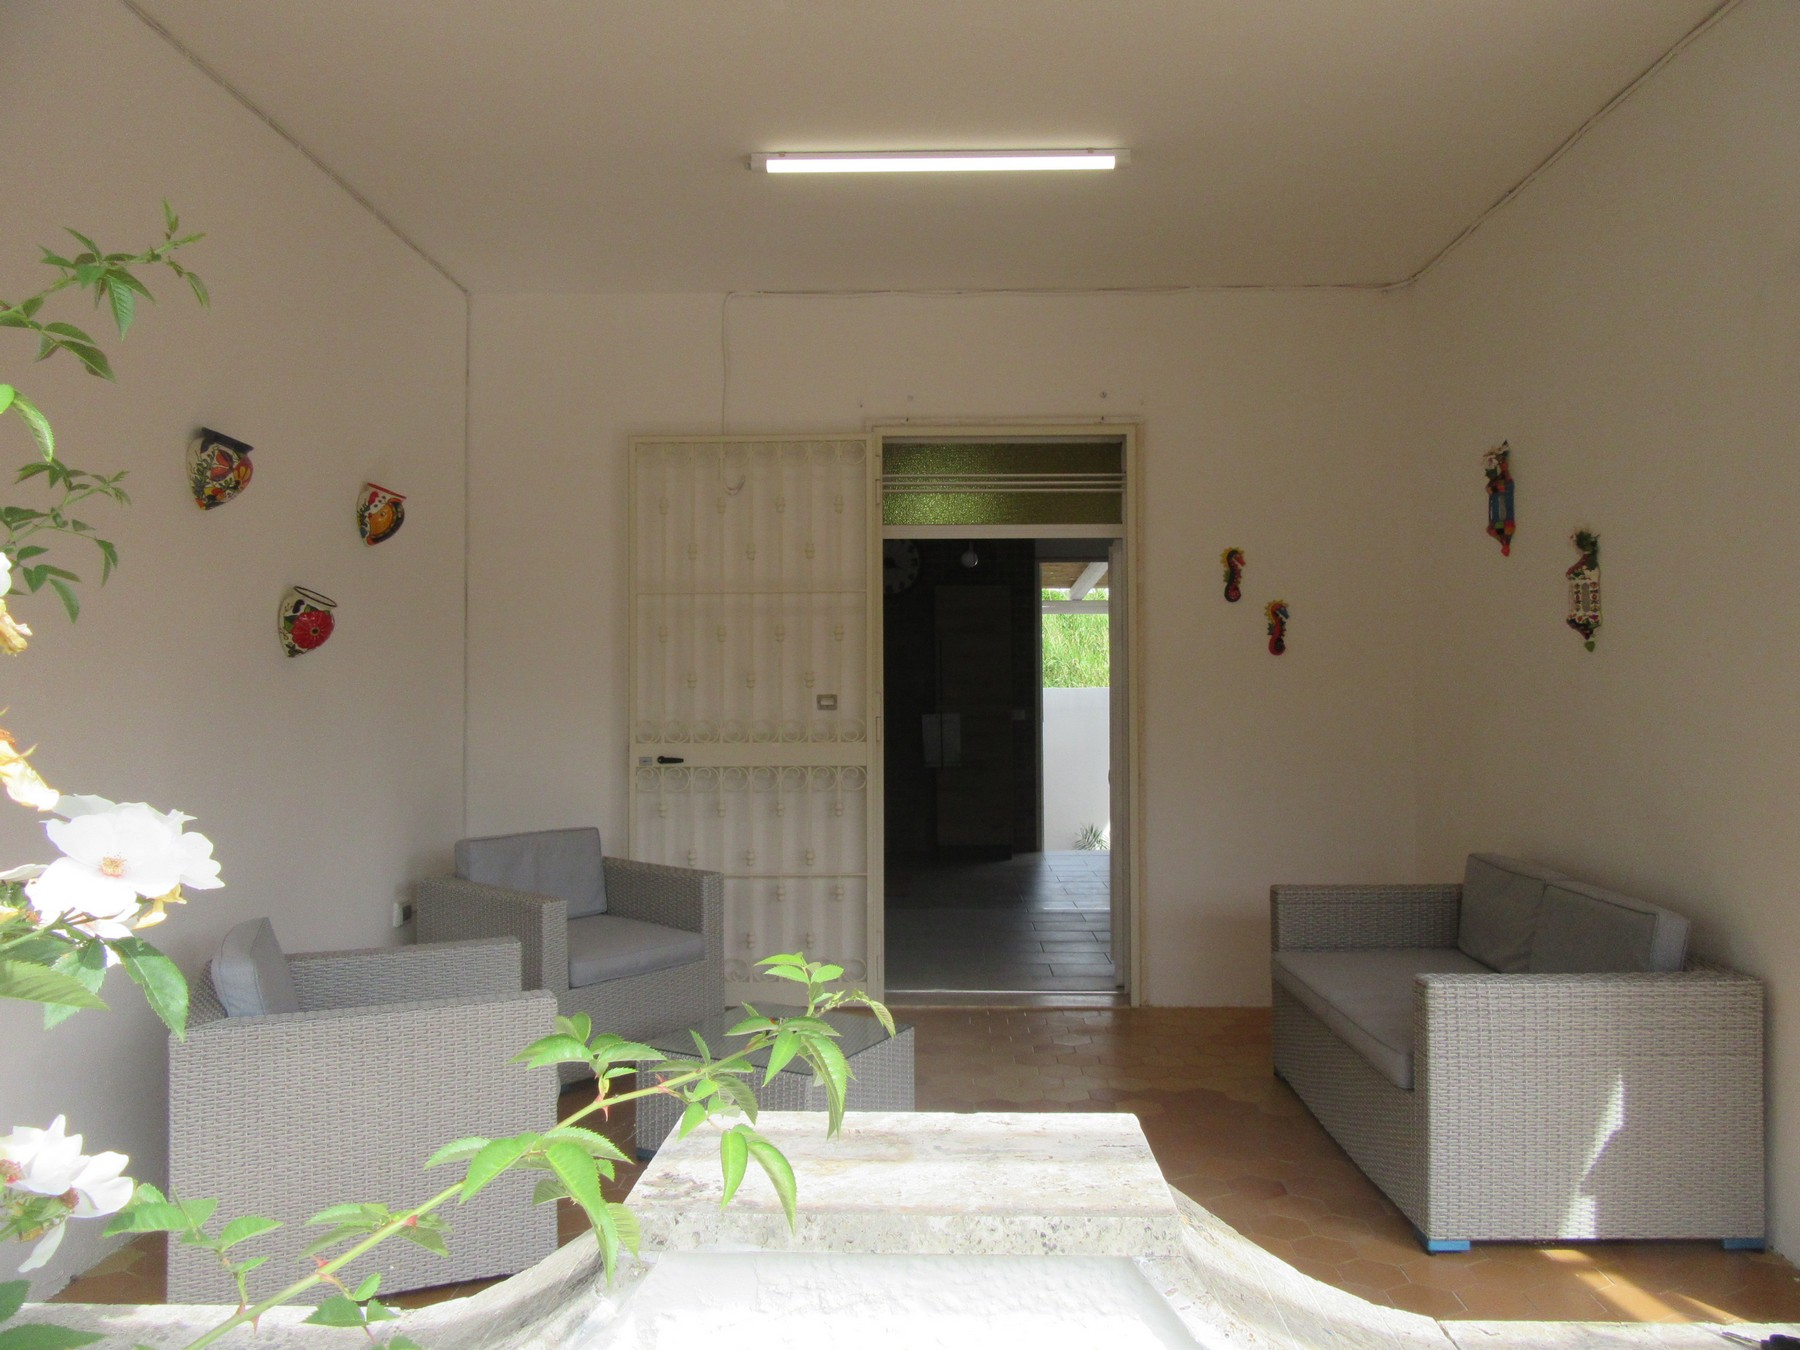 Ferienhaus Villa Mariposa n°3, only 200 meters from the beach (2354067), Porto Cesareo, Lecce, Apulien, Italien, Bild 2